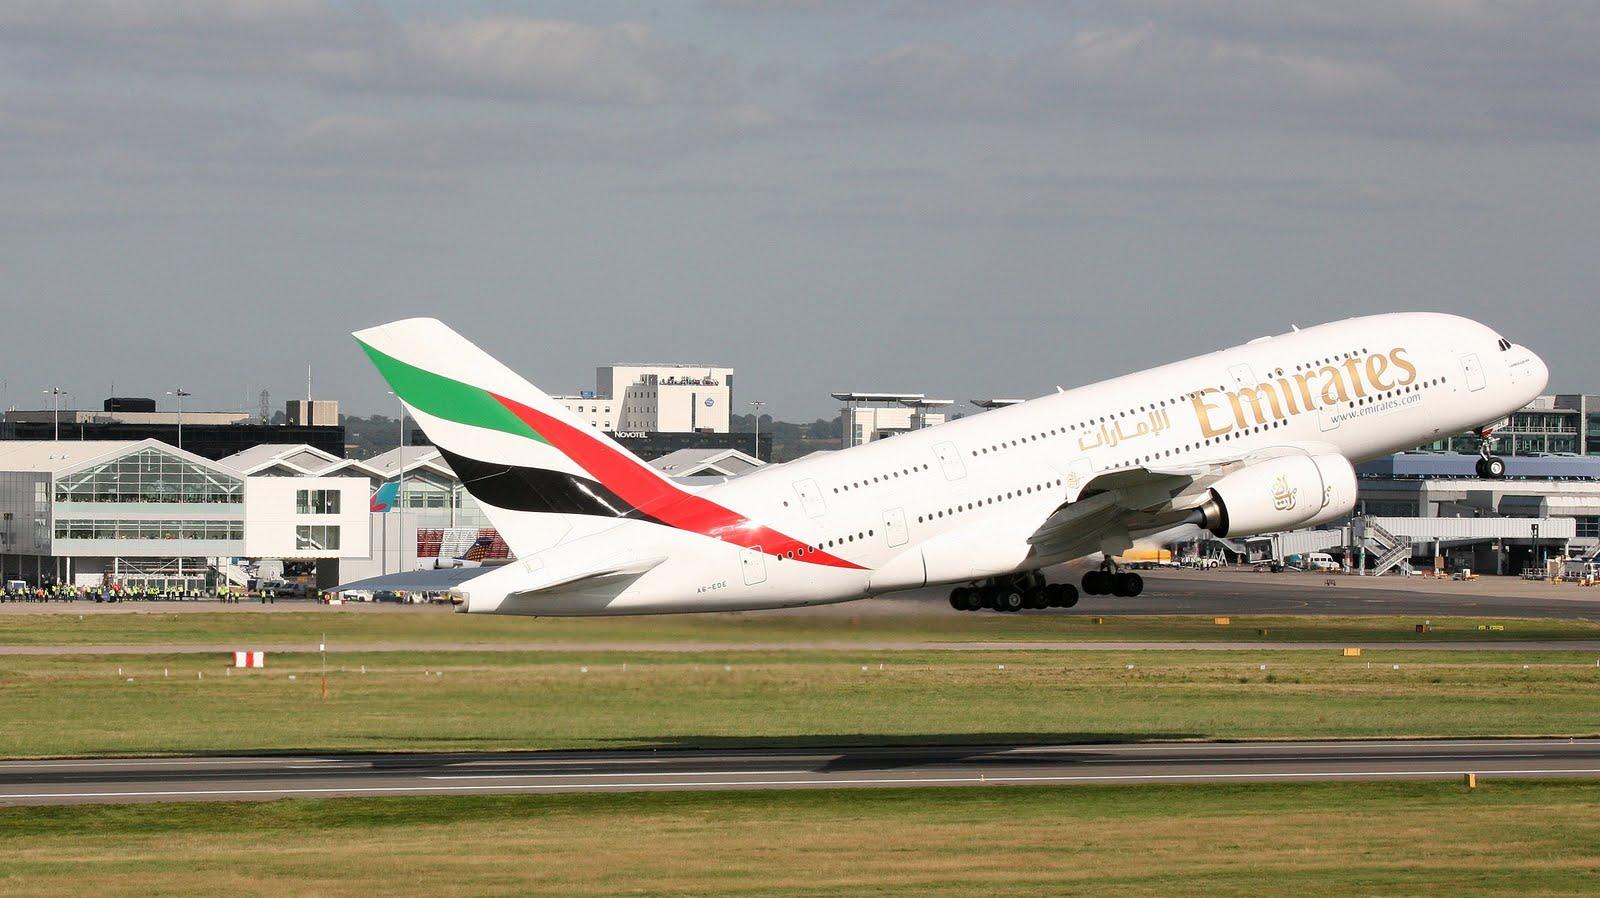 Emirates Airlines Airbus A380 Take Off Wallpaper 755   AERONEFNET 1600x898